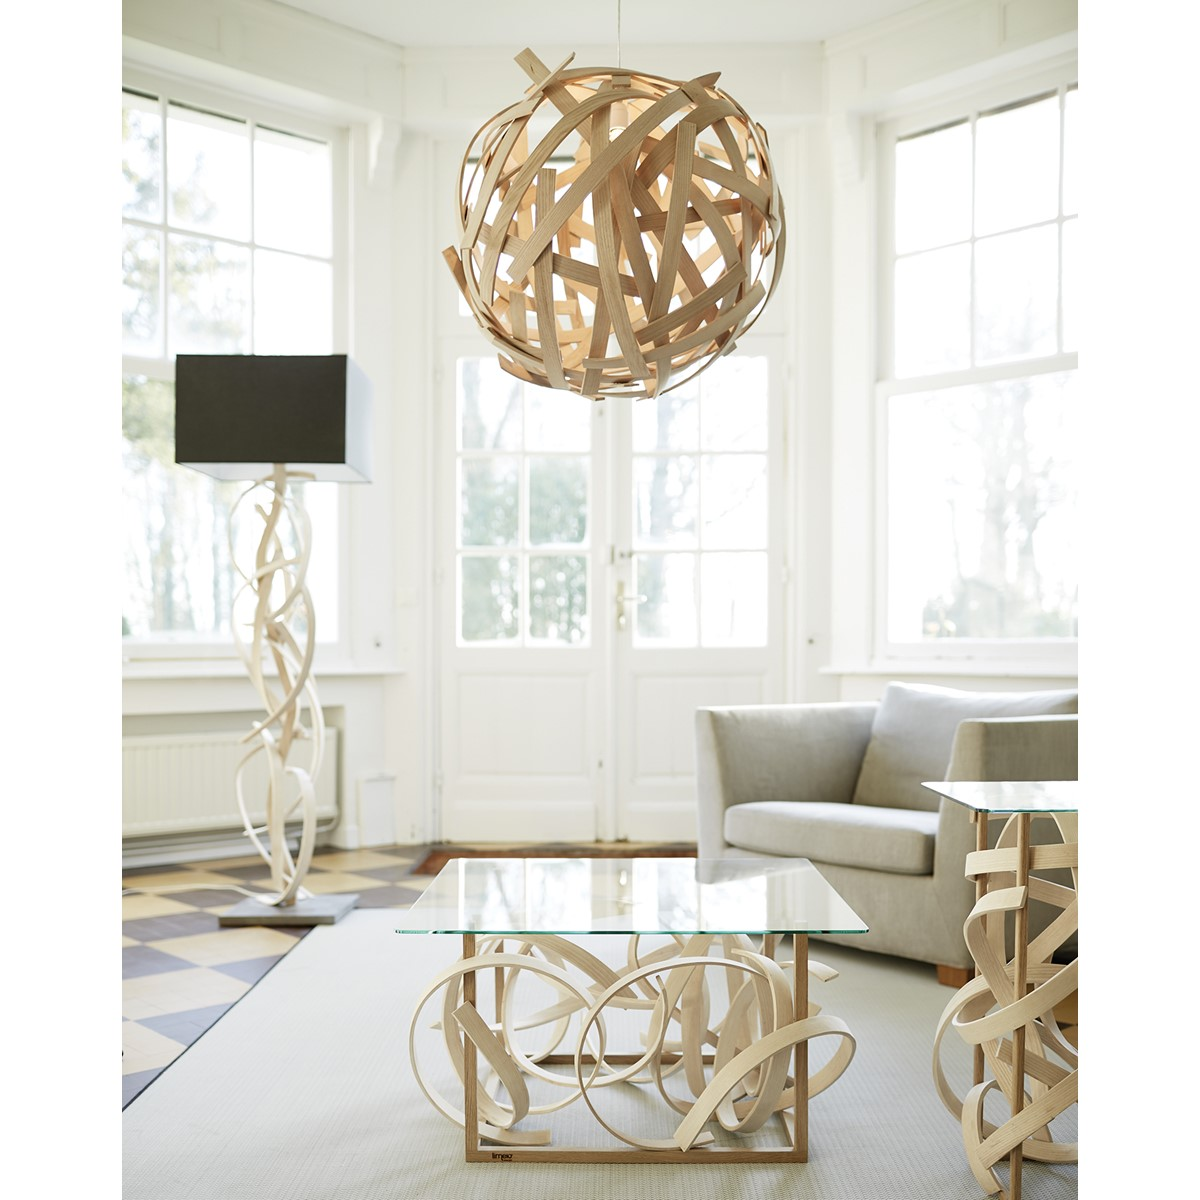 Lustre Design Bois : Lustre design en bois Anouk LIMELO DESIGN